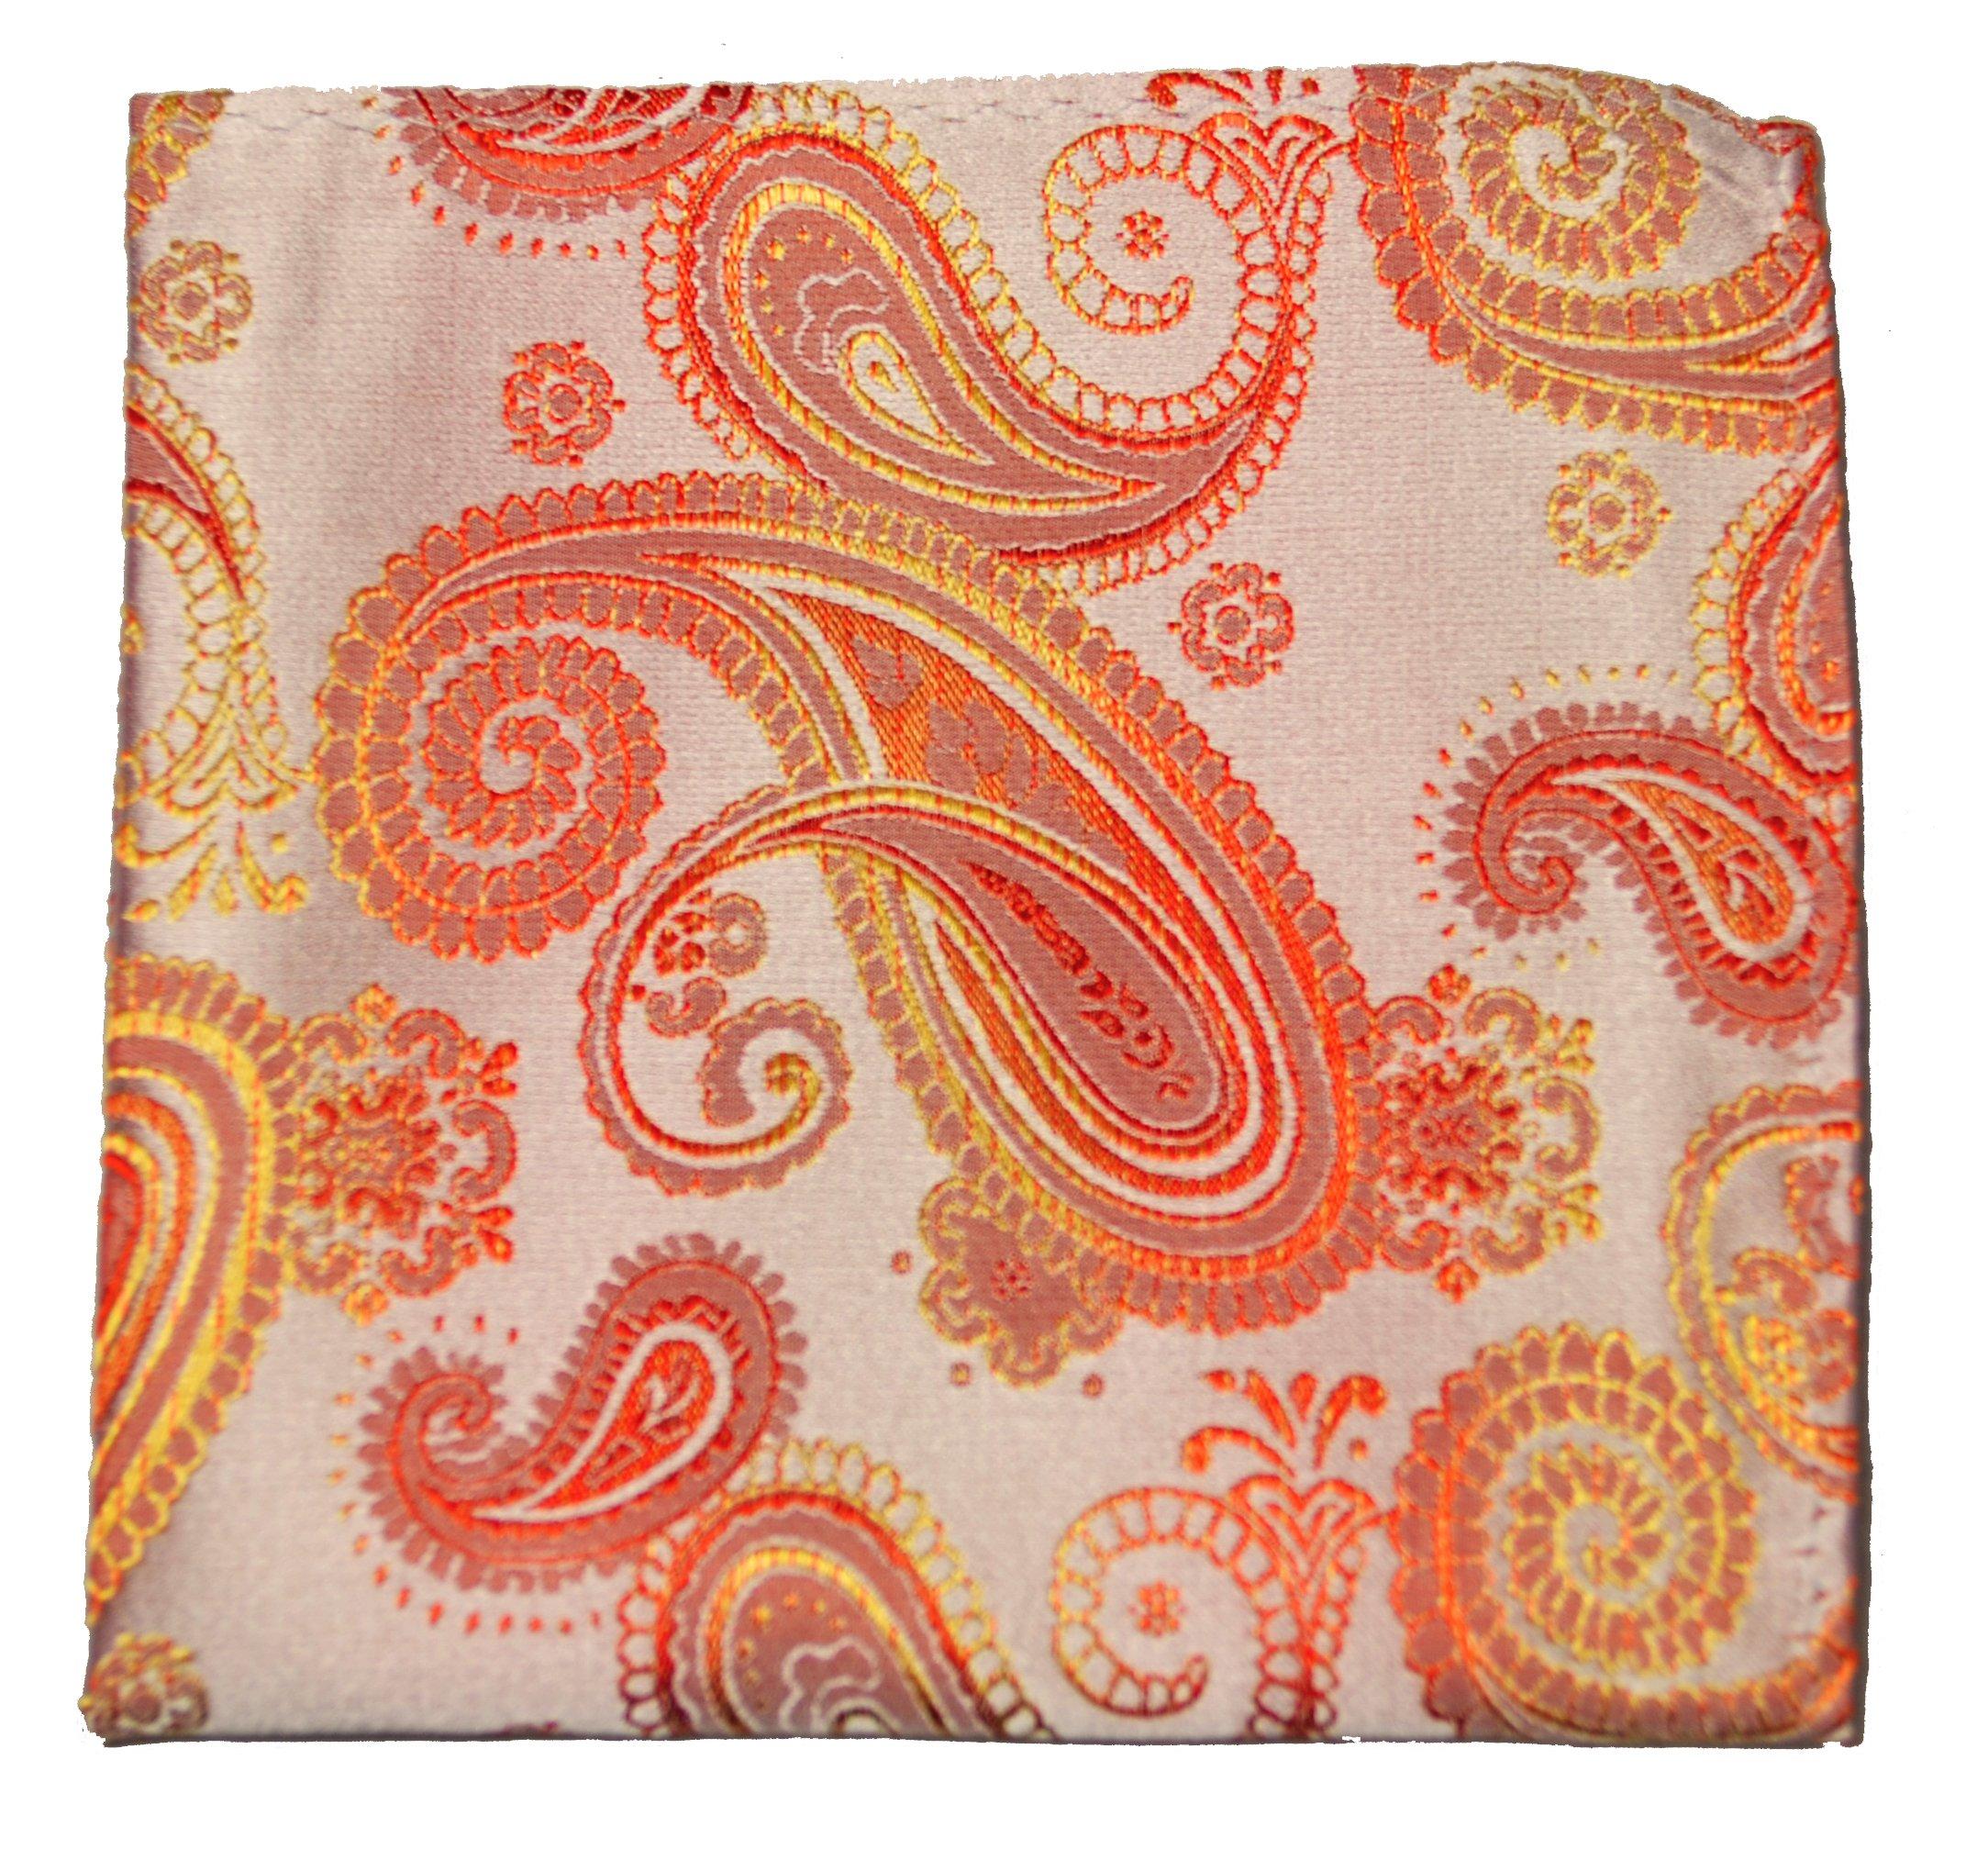 Mens Pocket Square Handkerchief 100% Silk . Coral Paisley